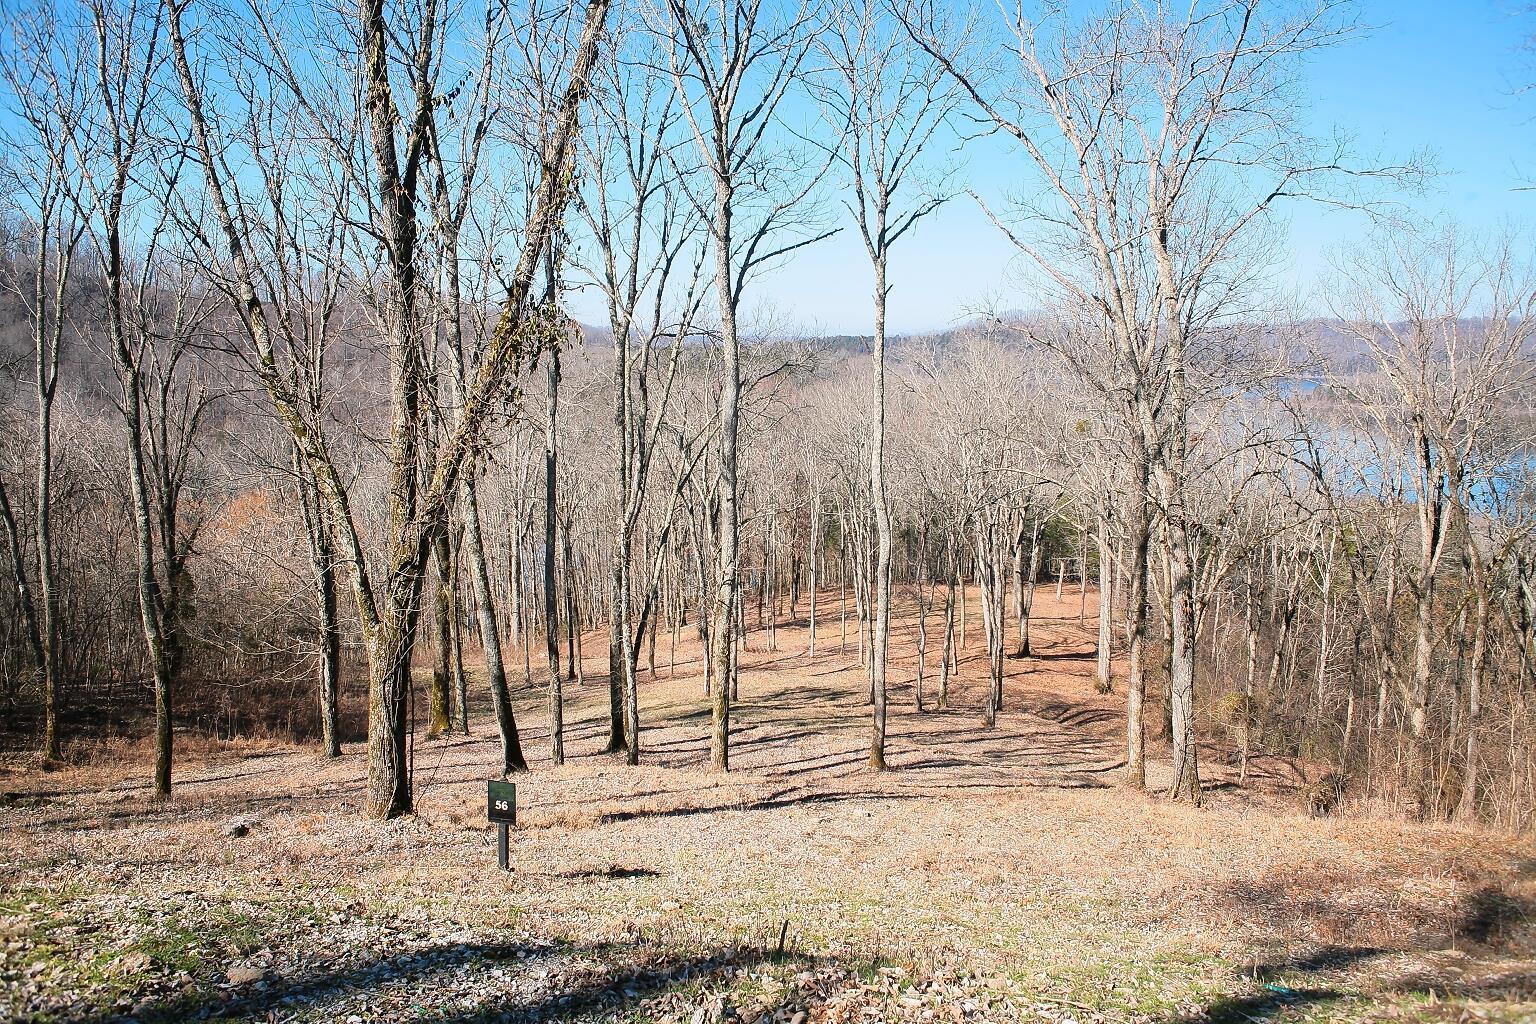 410 Wilson Cir, Smithville, TN 37166 - Smithville, TN real estate listing